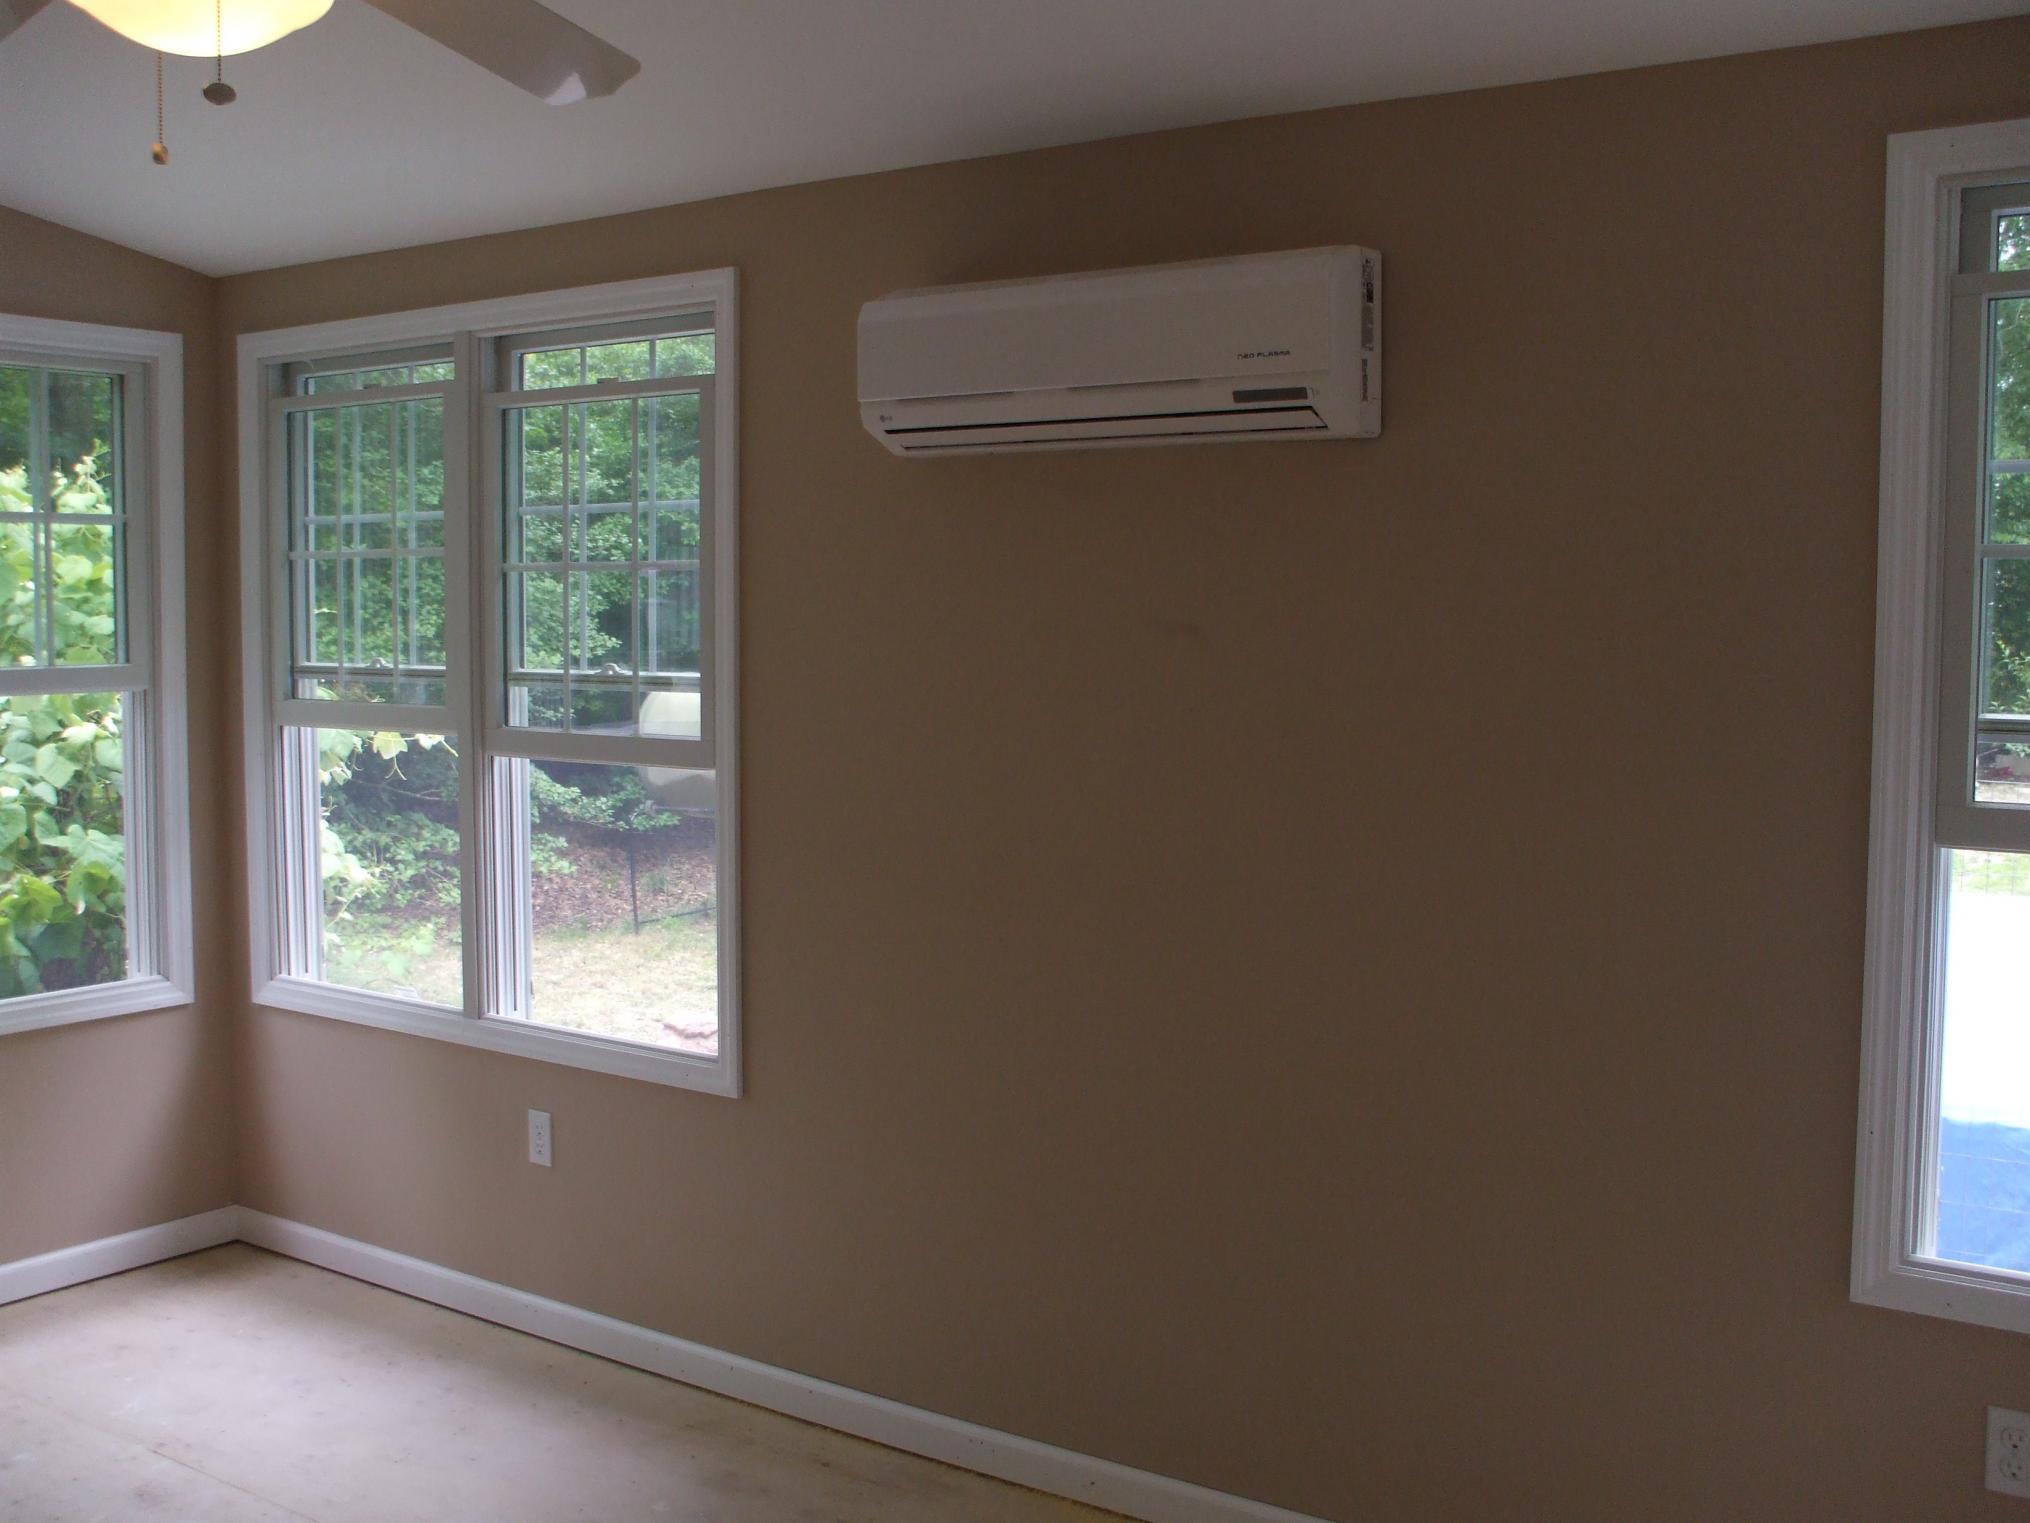 Framing A Sun Porch For Windows - Framing - Contractor Talk